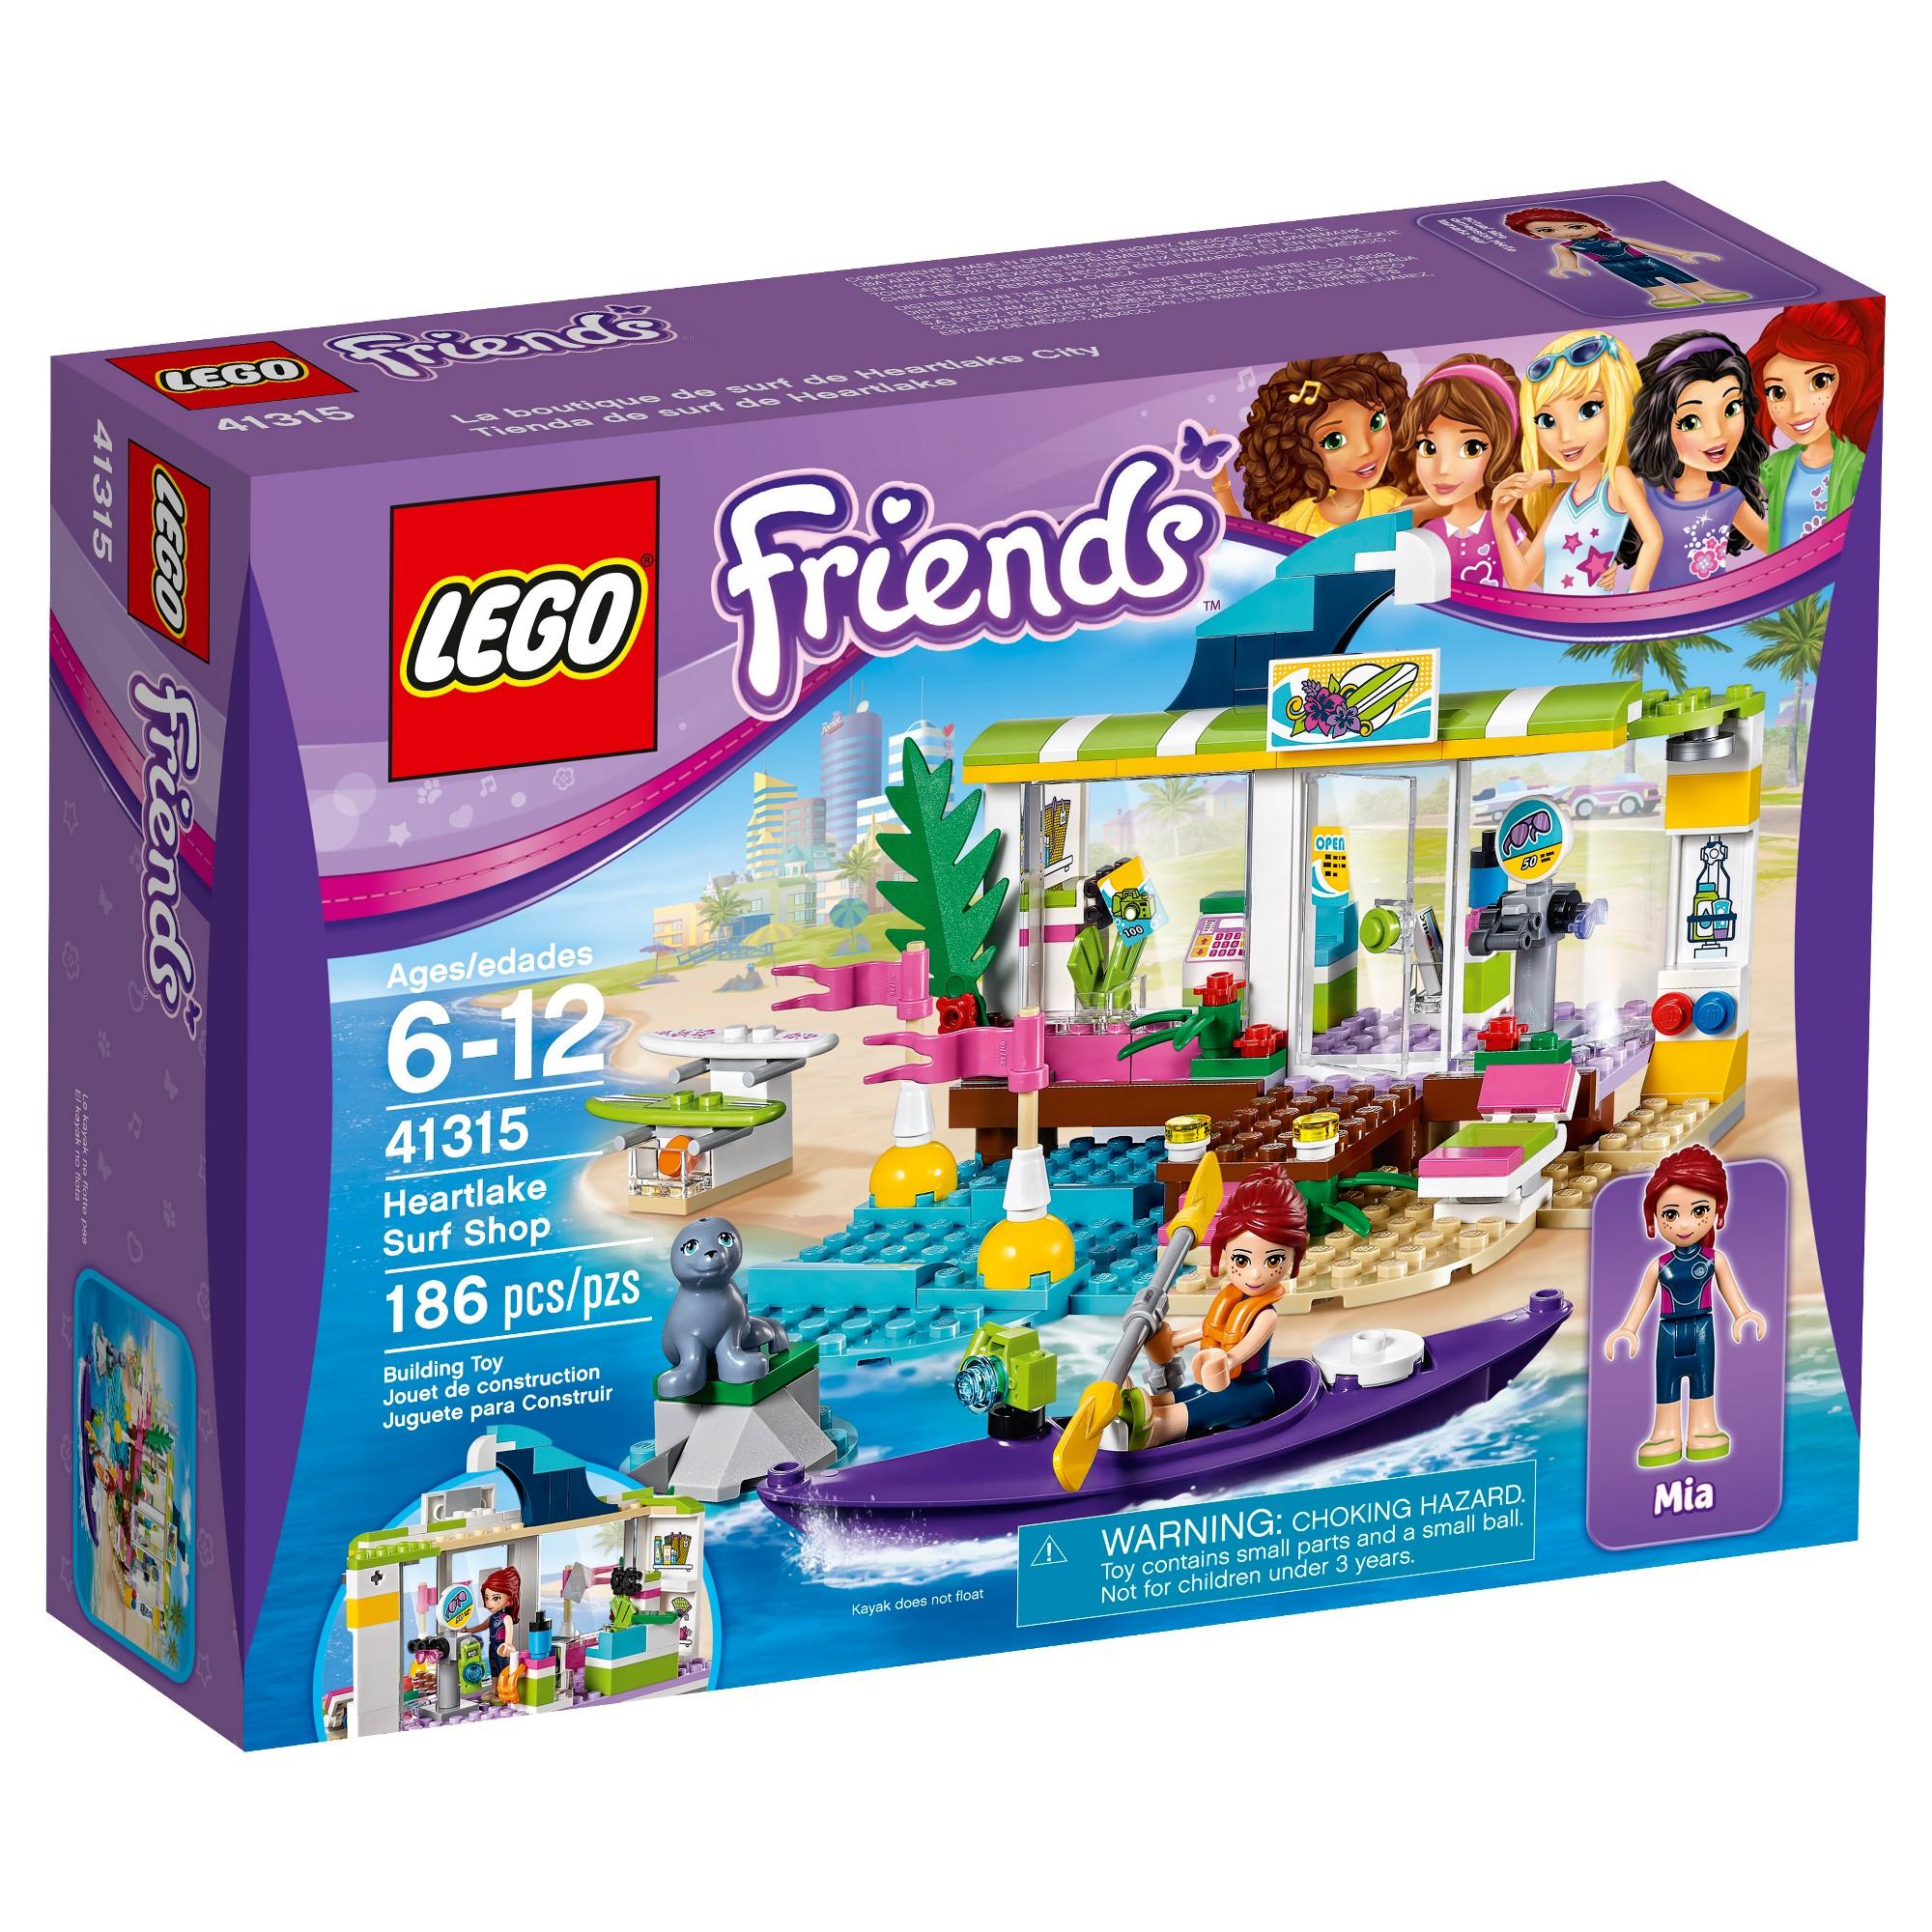 Lego Friends Heartlake Surf Shop 41315 Products Lego Friends